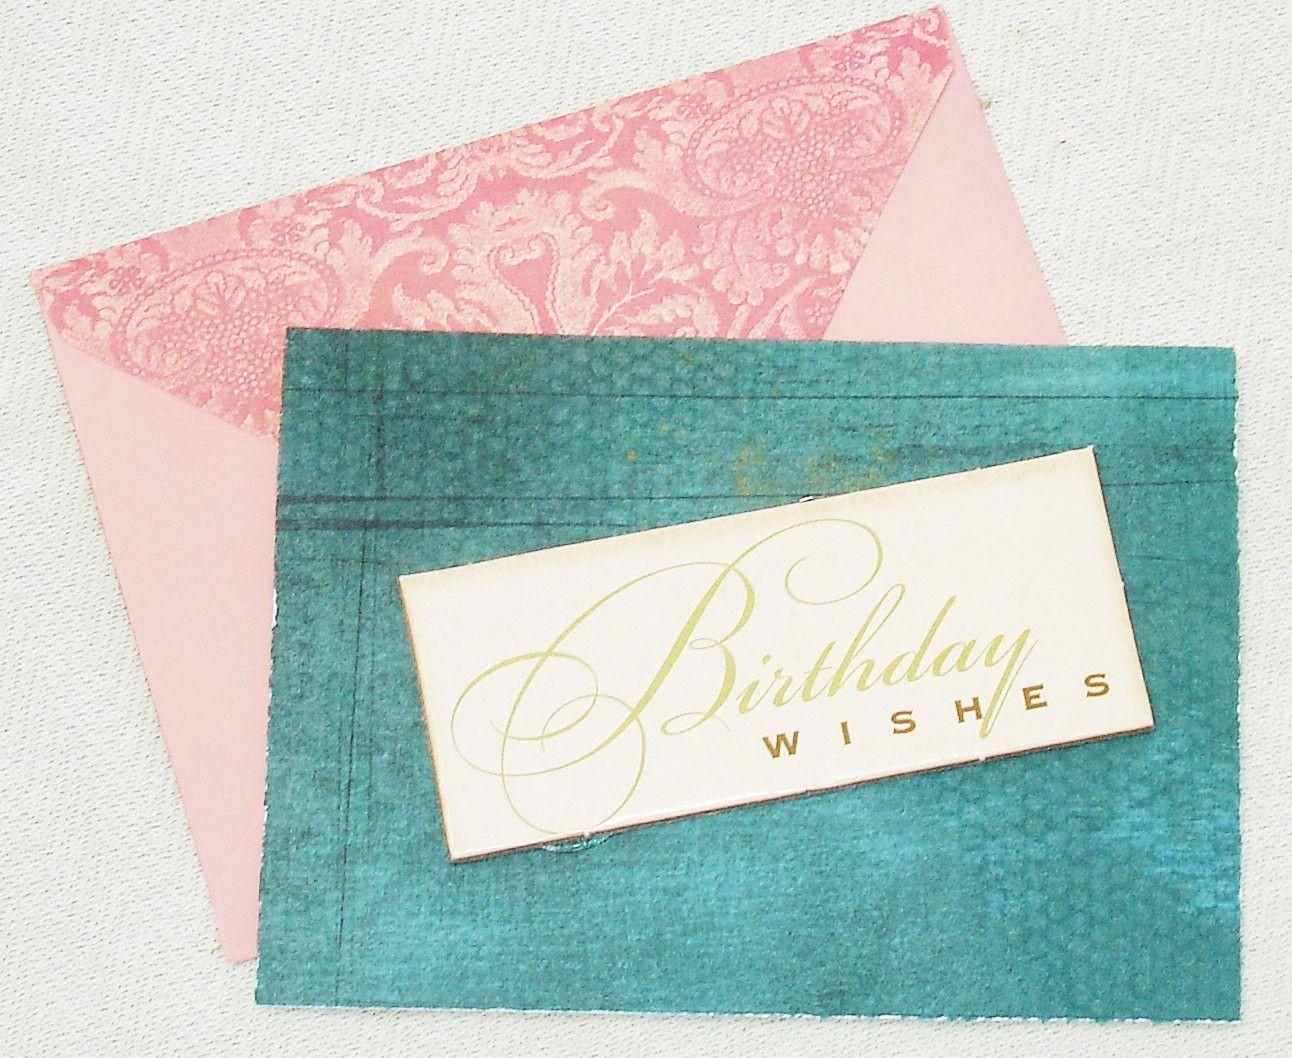 Handmade elegant happy birthday wishes greeting card products